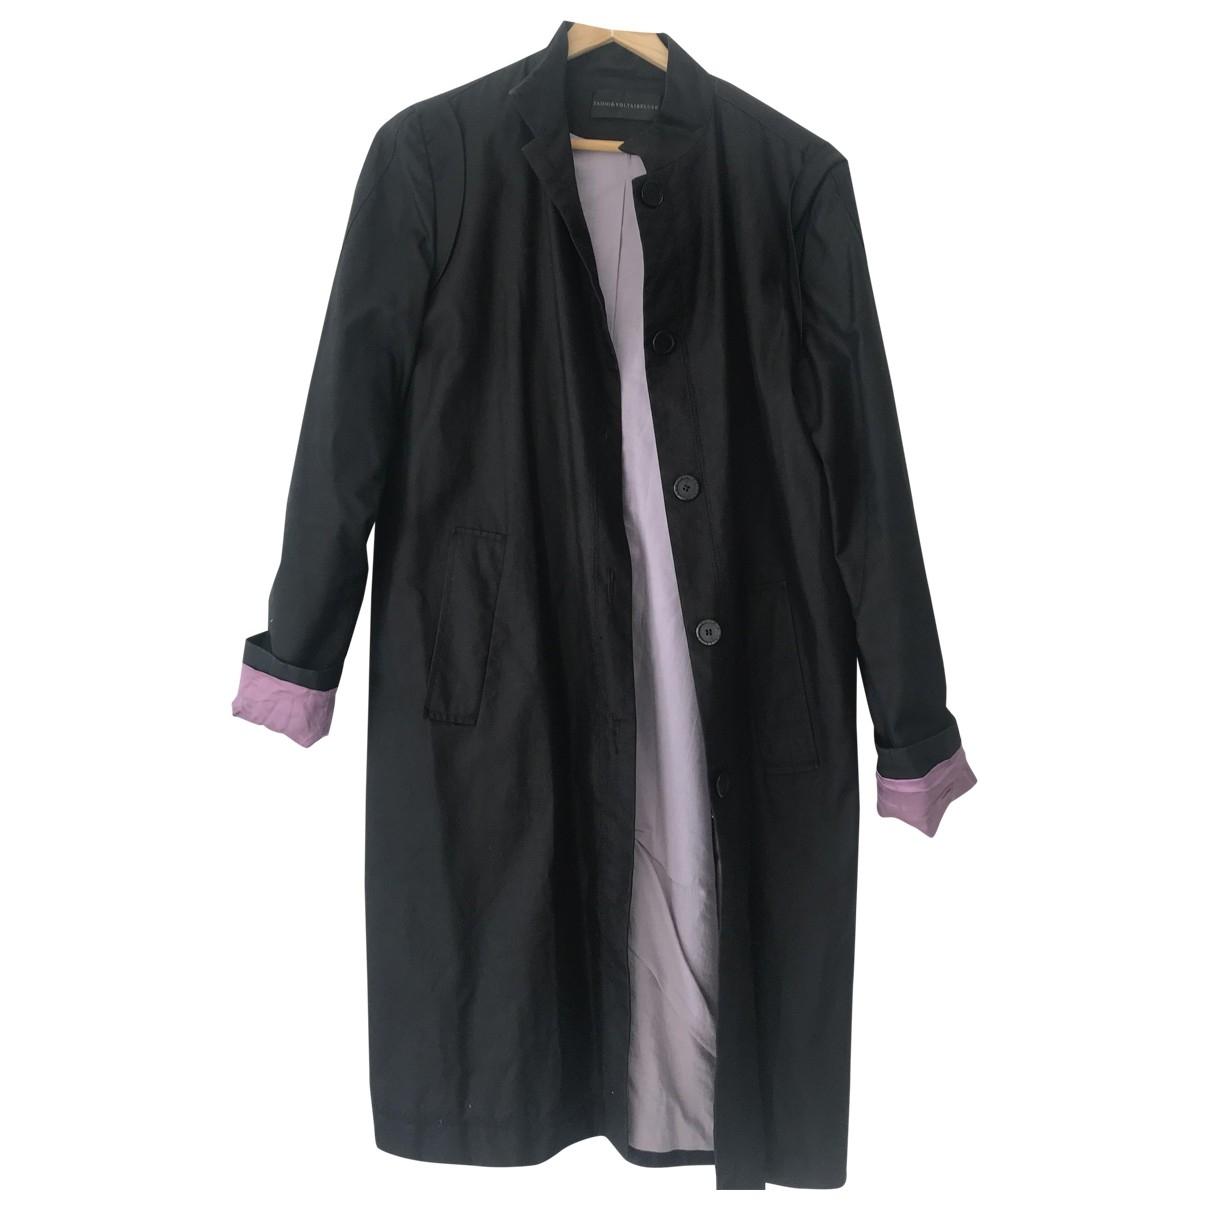 Zadig & Voltaire \N Black Cotton coat for Women M International